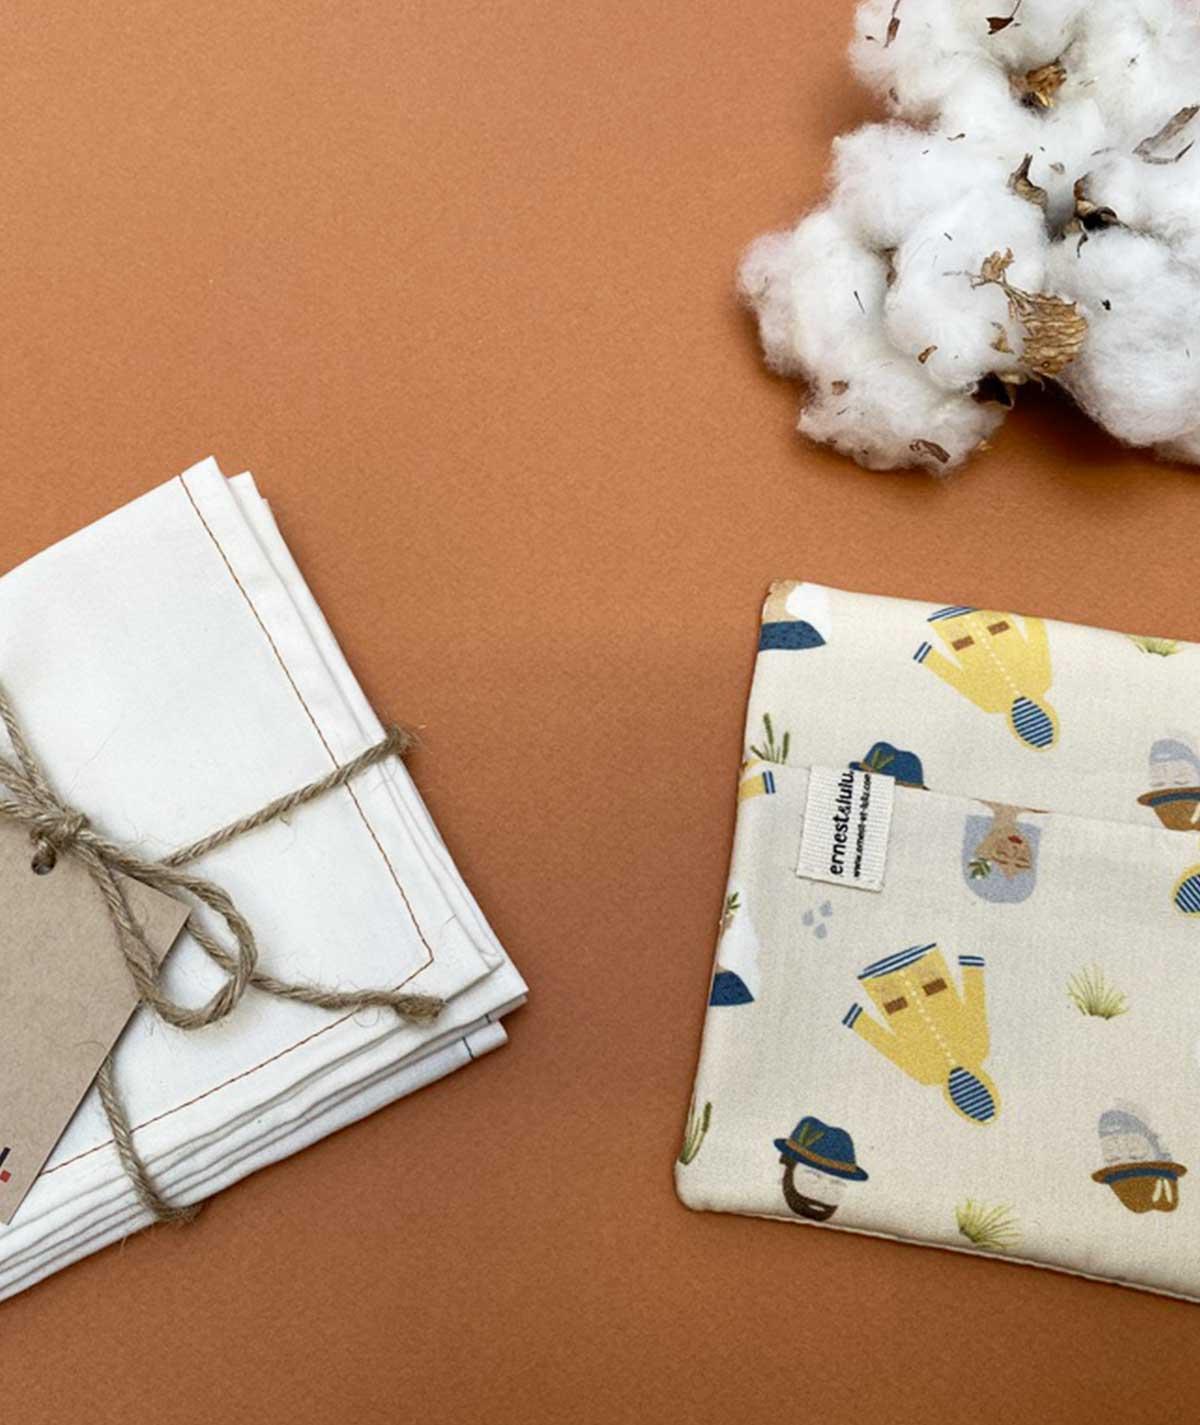 mouchoir en tissu blanc - fabrication francaise - artisanal - collections originales